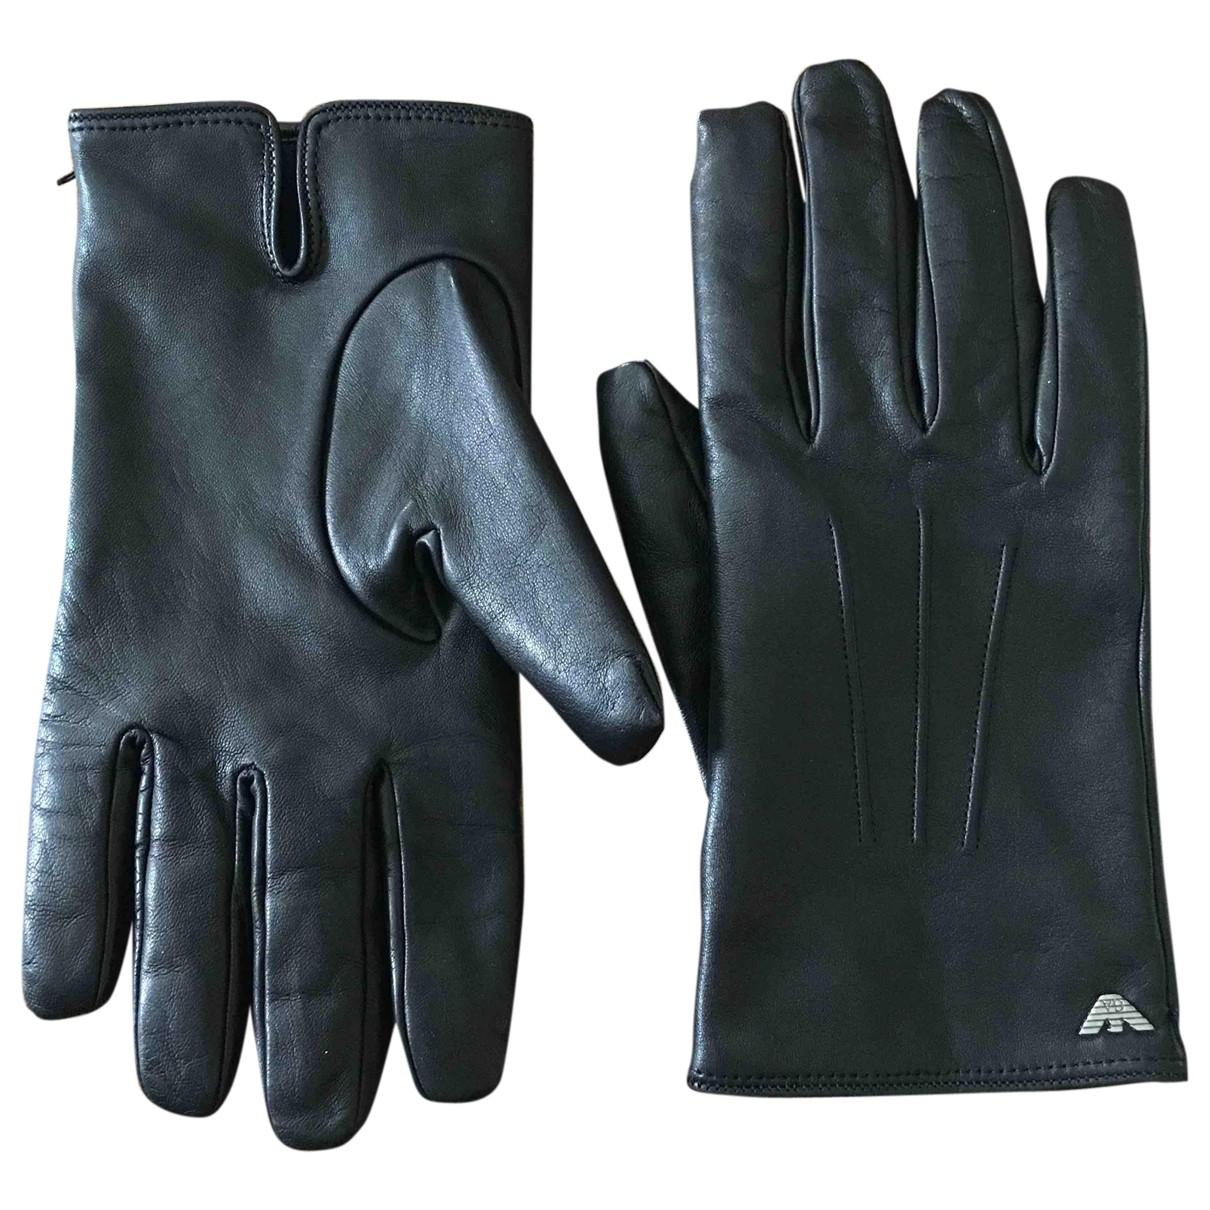 Emporio Armani \N Black Leather Gloves for Men L International